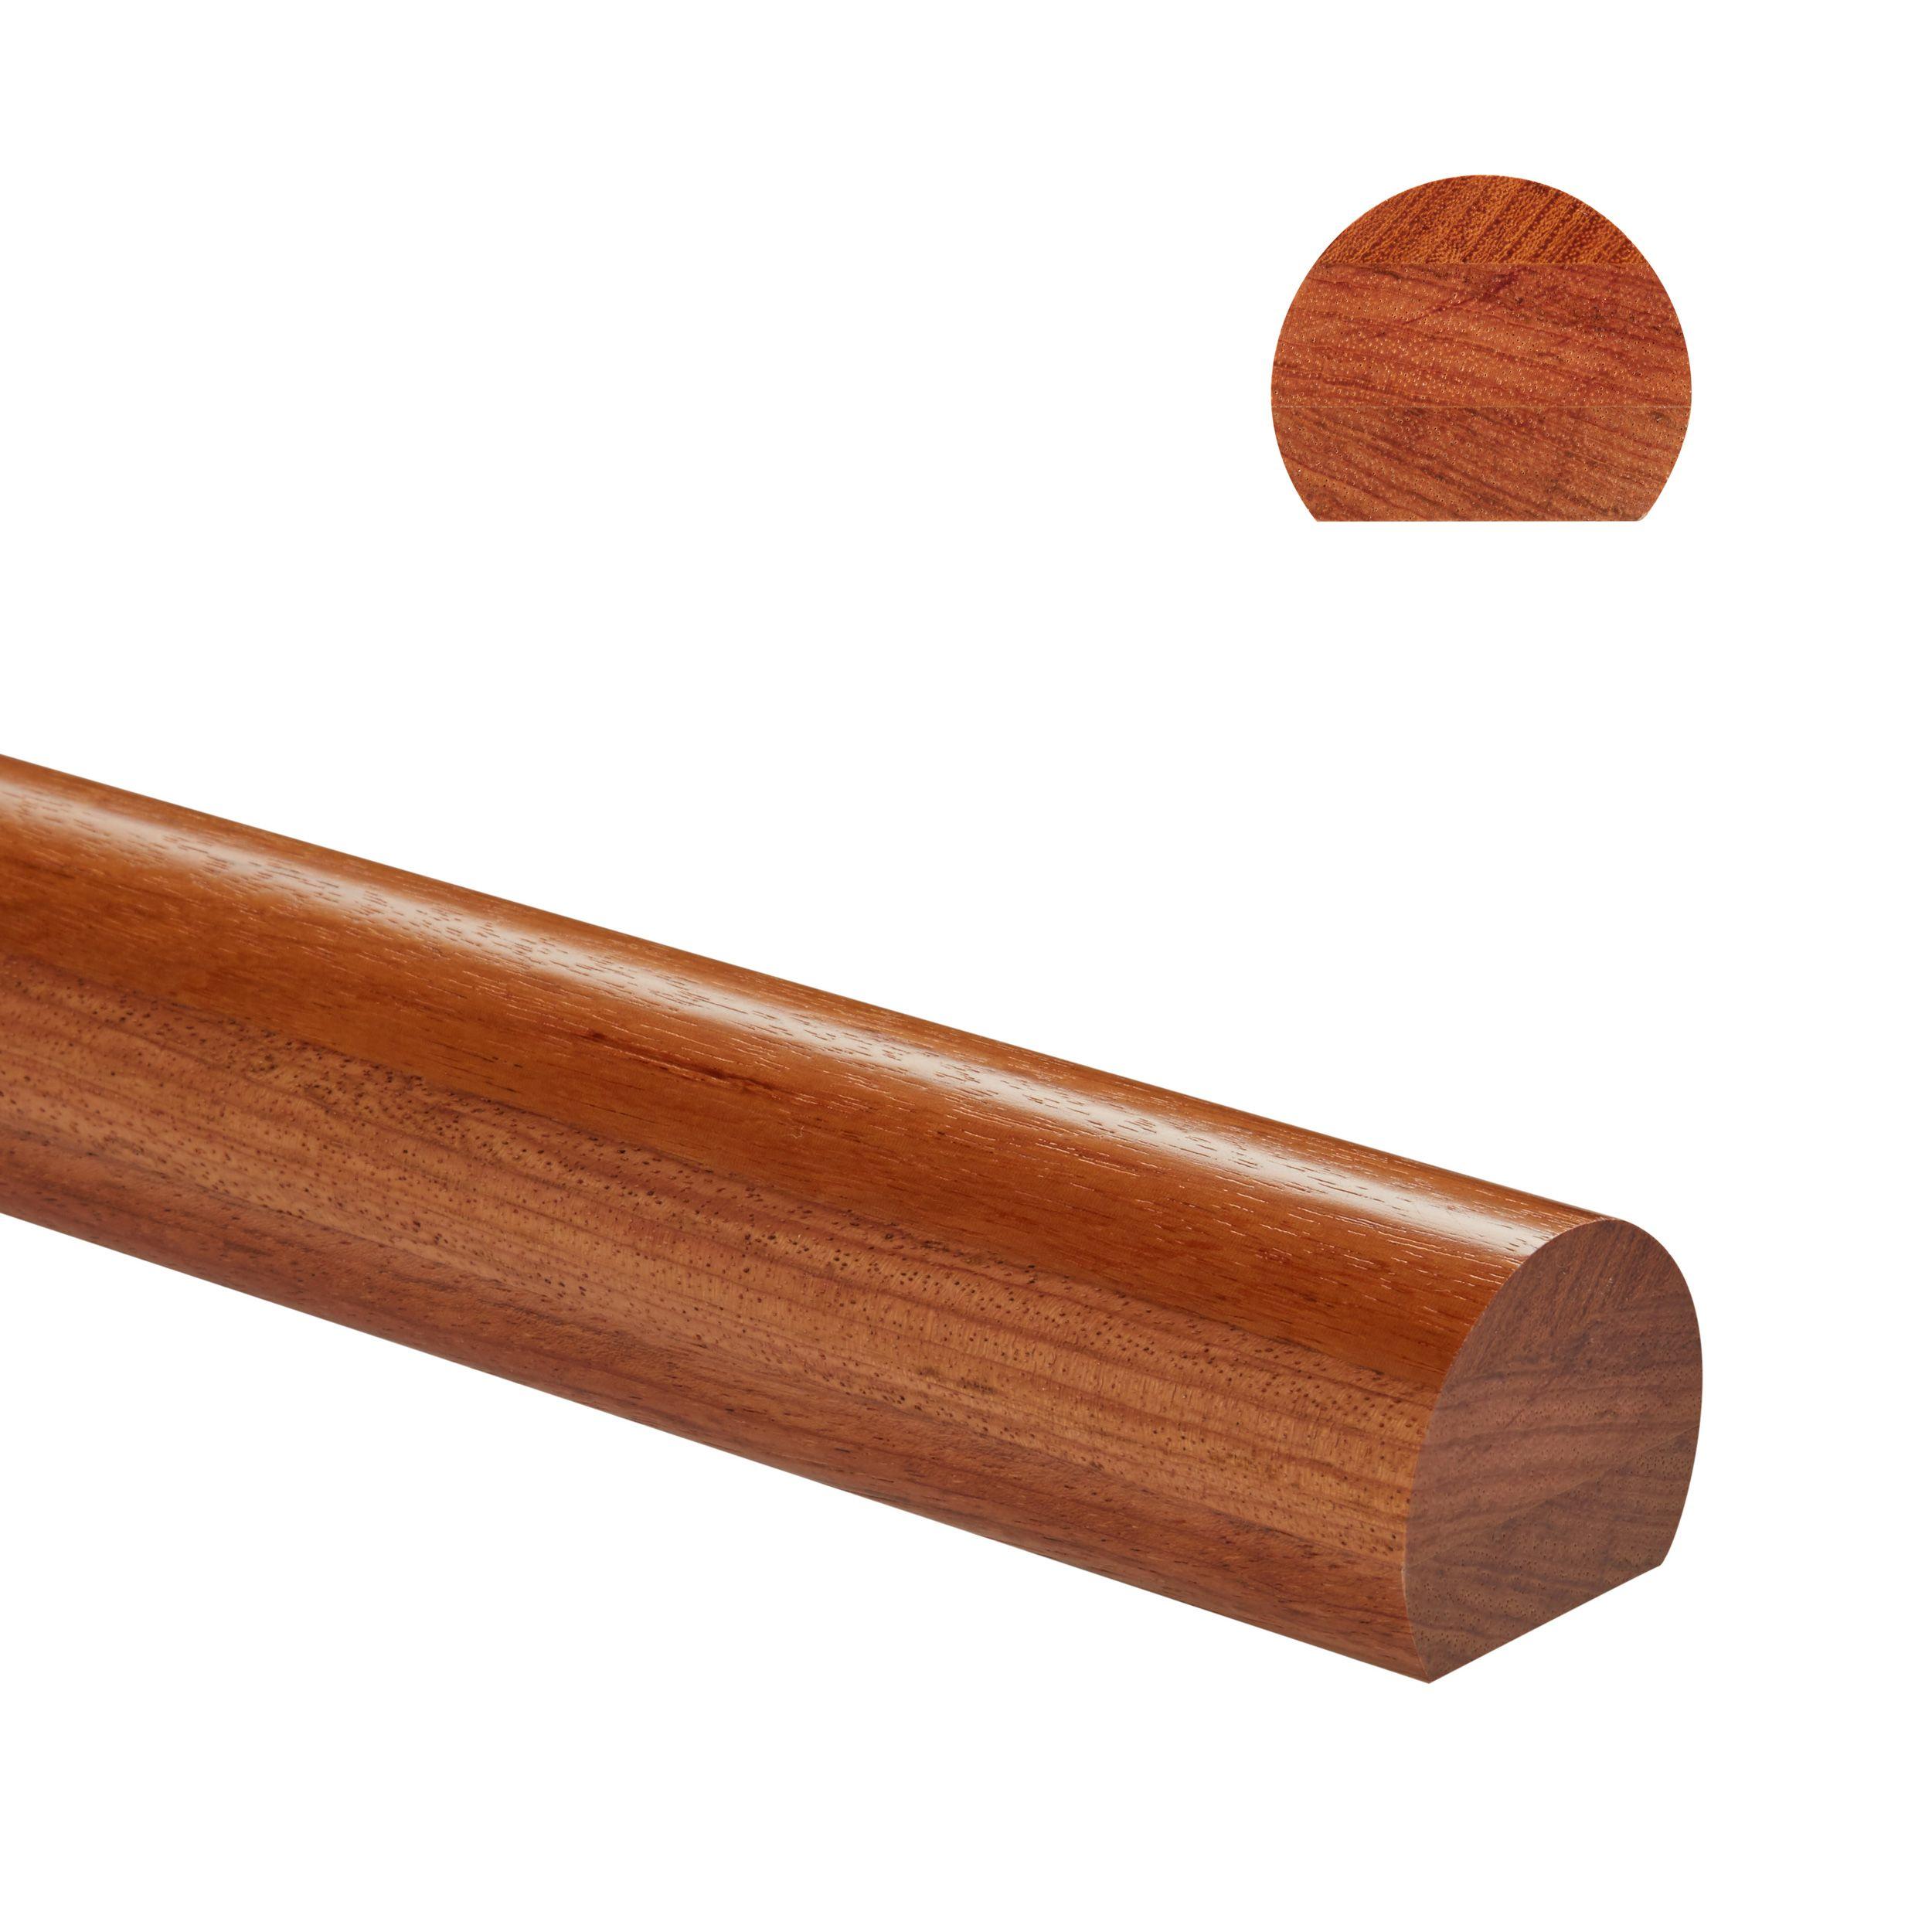 Code Requirements For Decks: Steel Handrail, Deck Railing Design